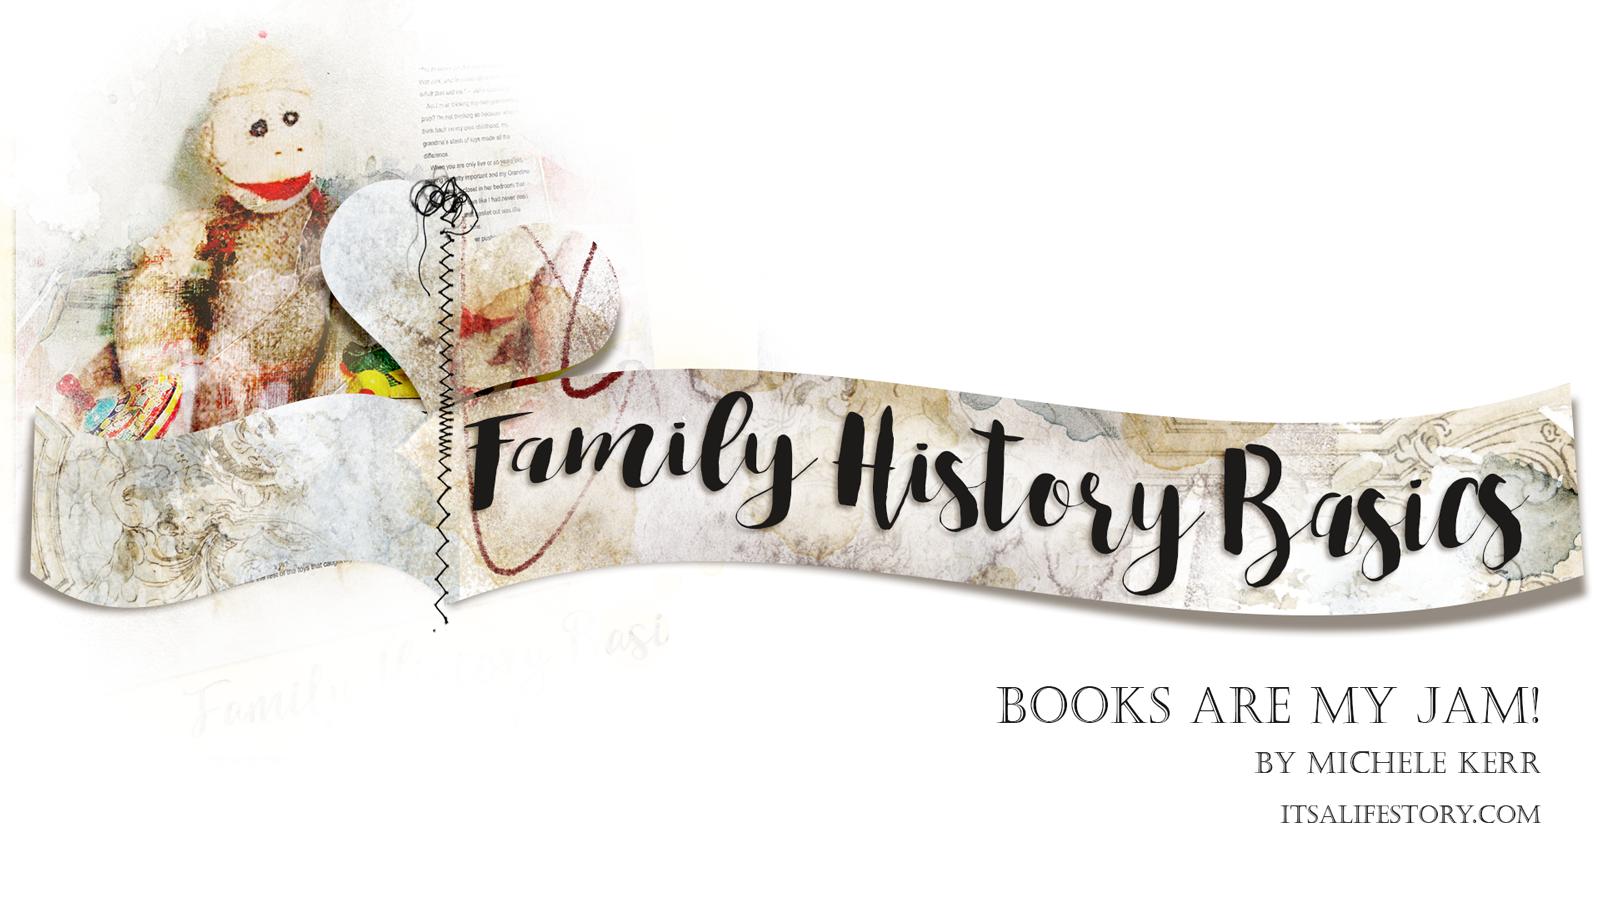 ItsALifeStory.com _ FAMILY HISTORY BASICS - Books are My Jam